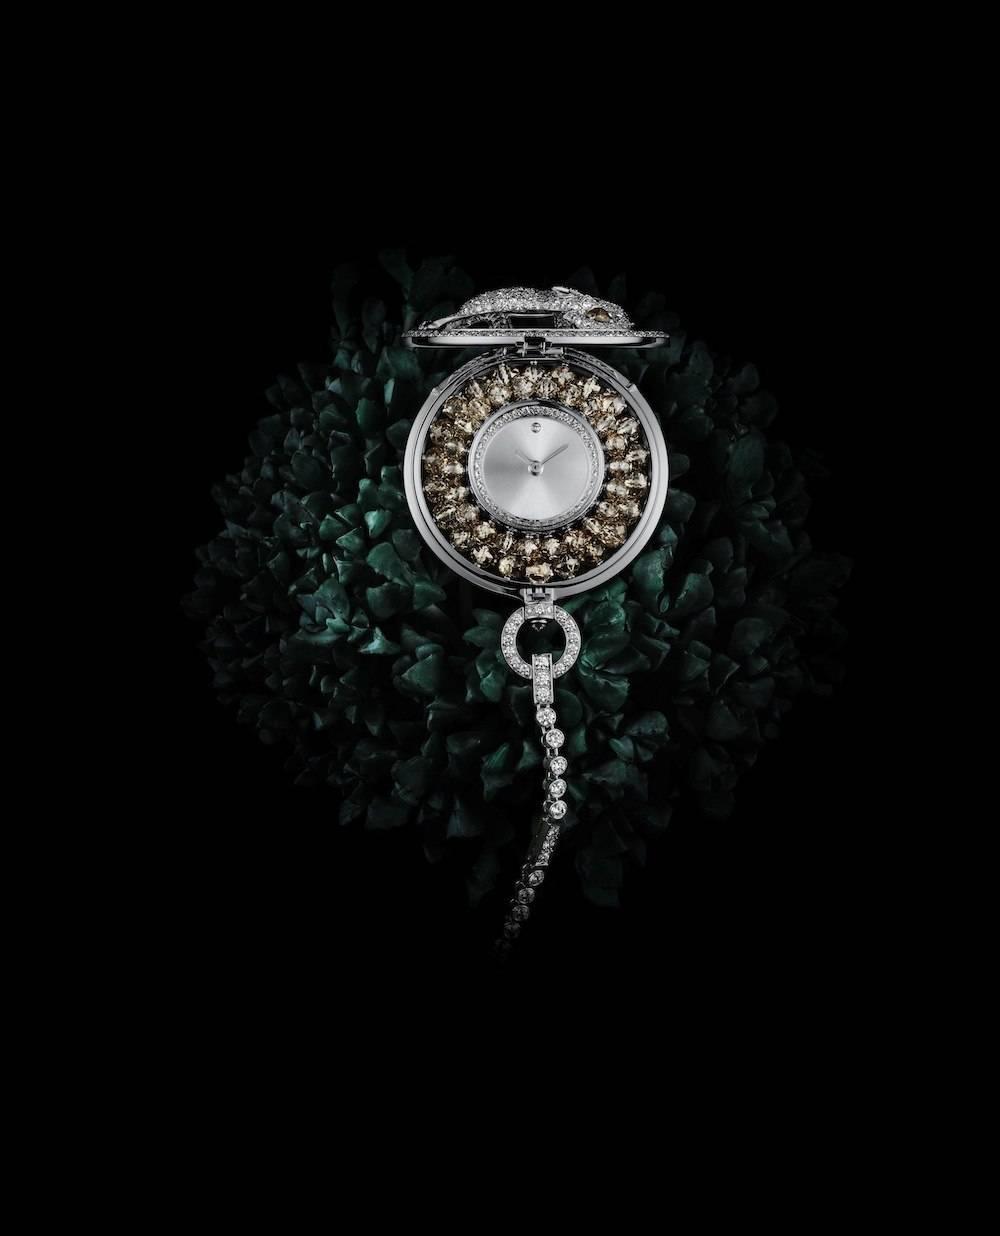 Haute Watch of the Week: Cartier Les Heures Fabuleux Pocket Watch